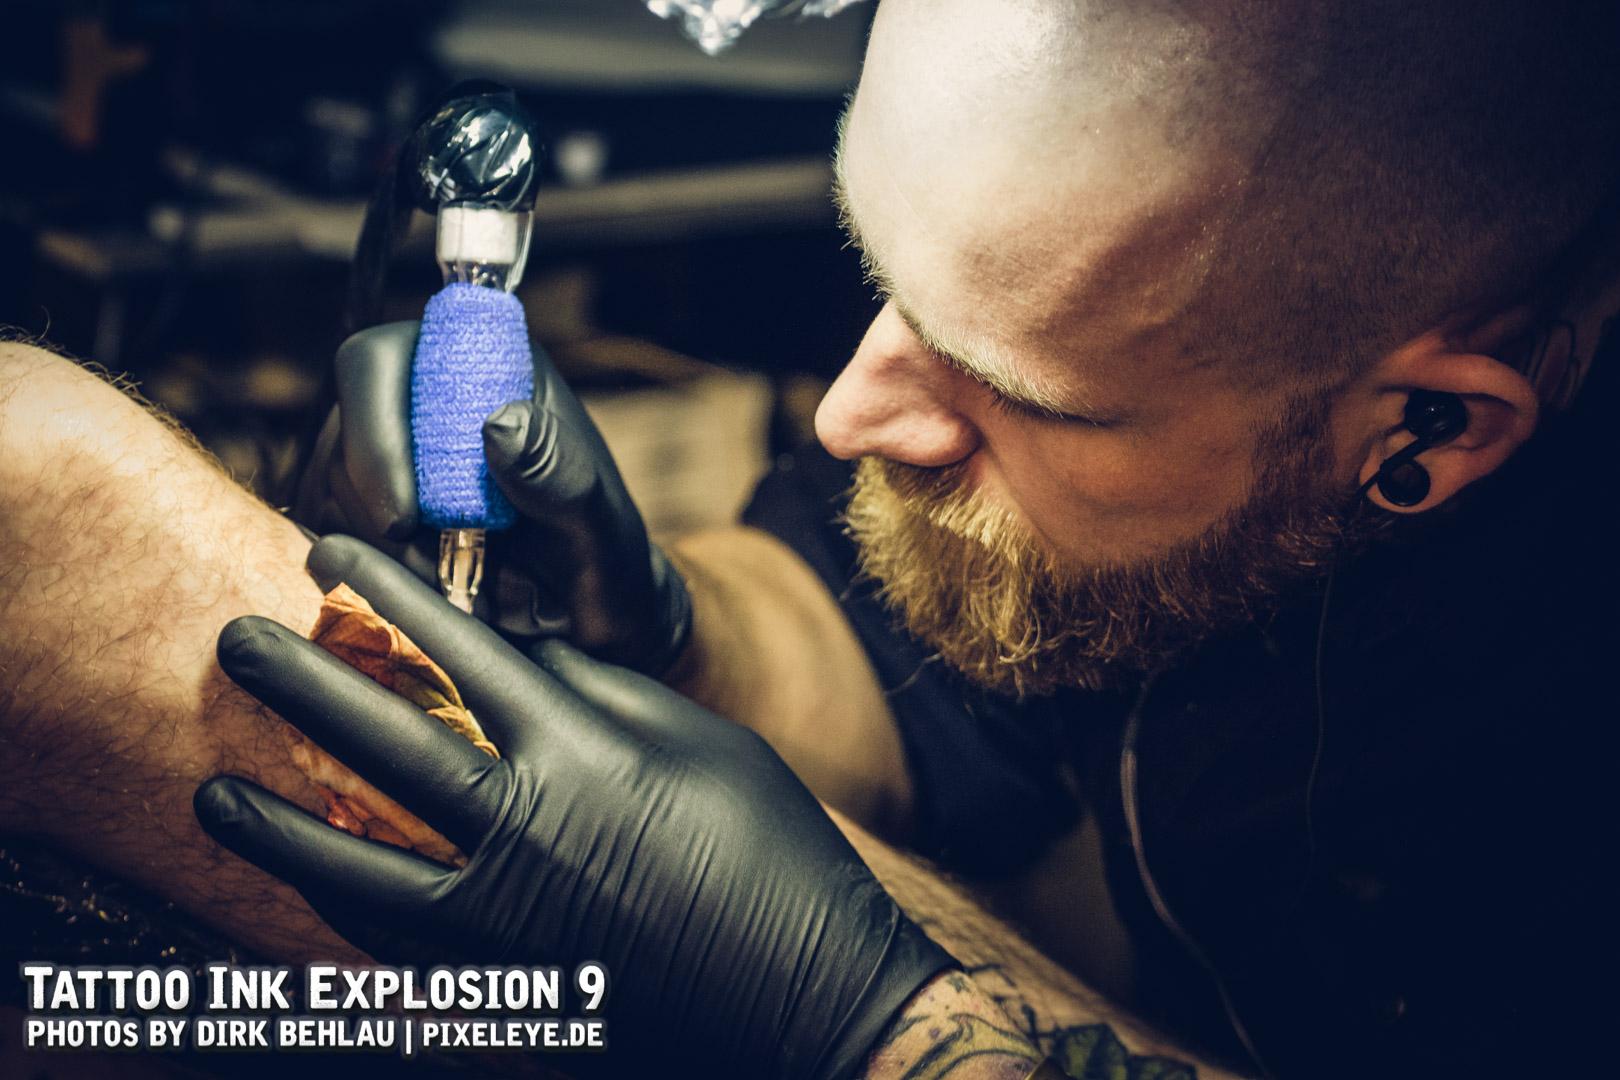 Tattoo Ink Explosion 2018 WEB by Dirk Behlau-1318.jpg